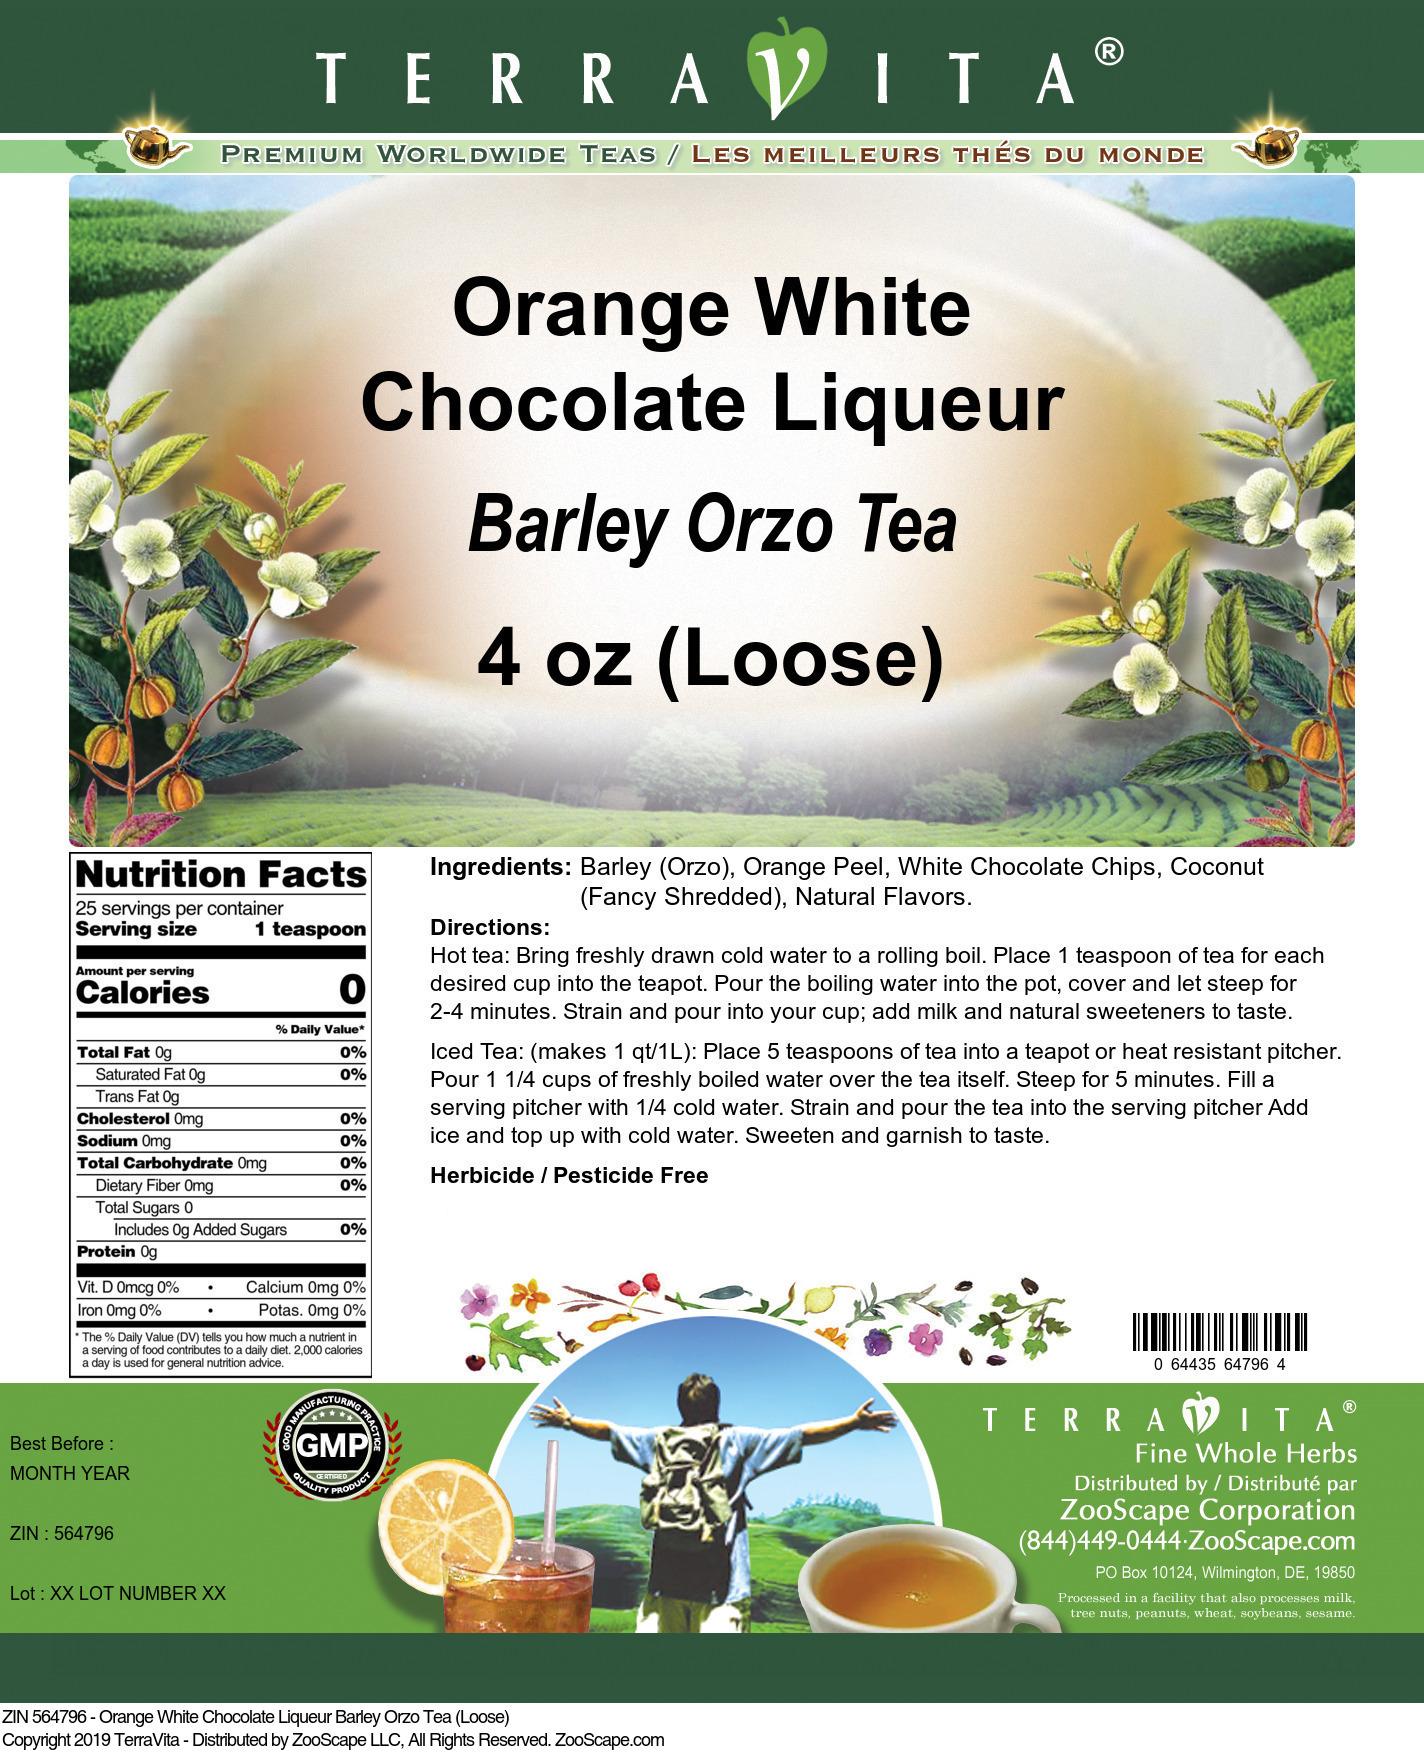 Orange White Chocolate Liqueur Barley Orzo Tea (Loose)